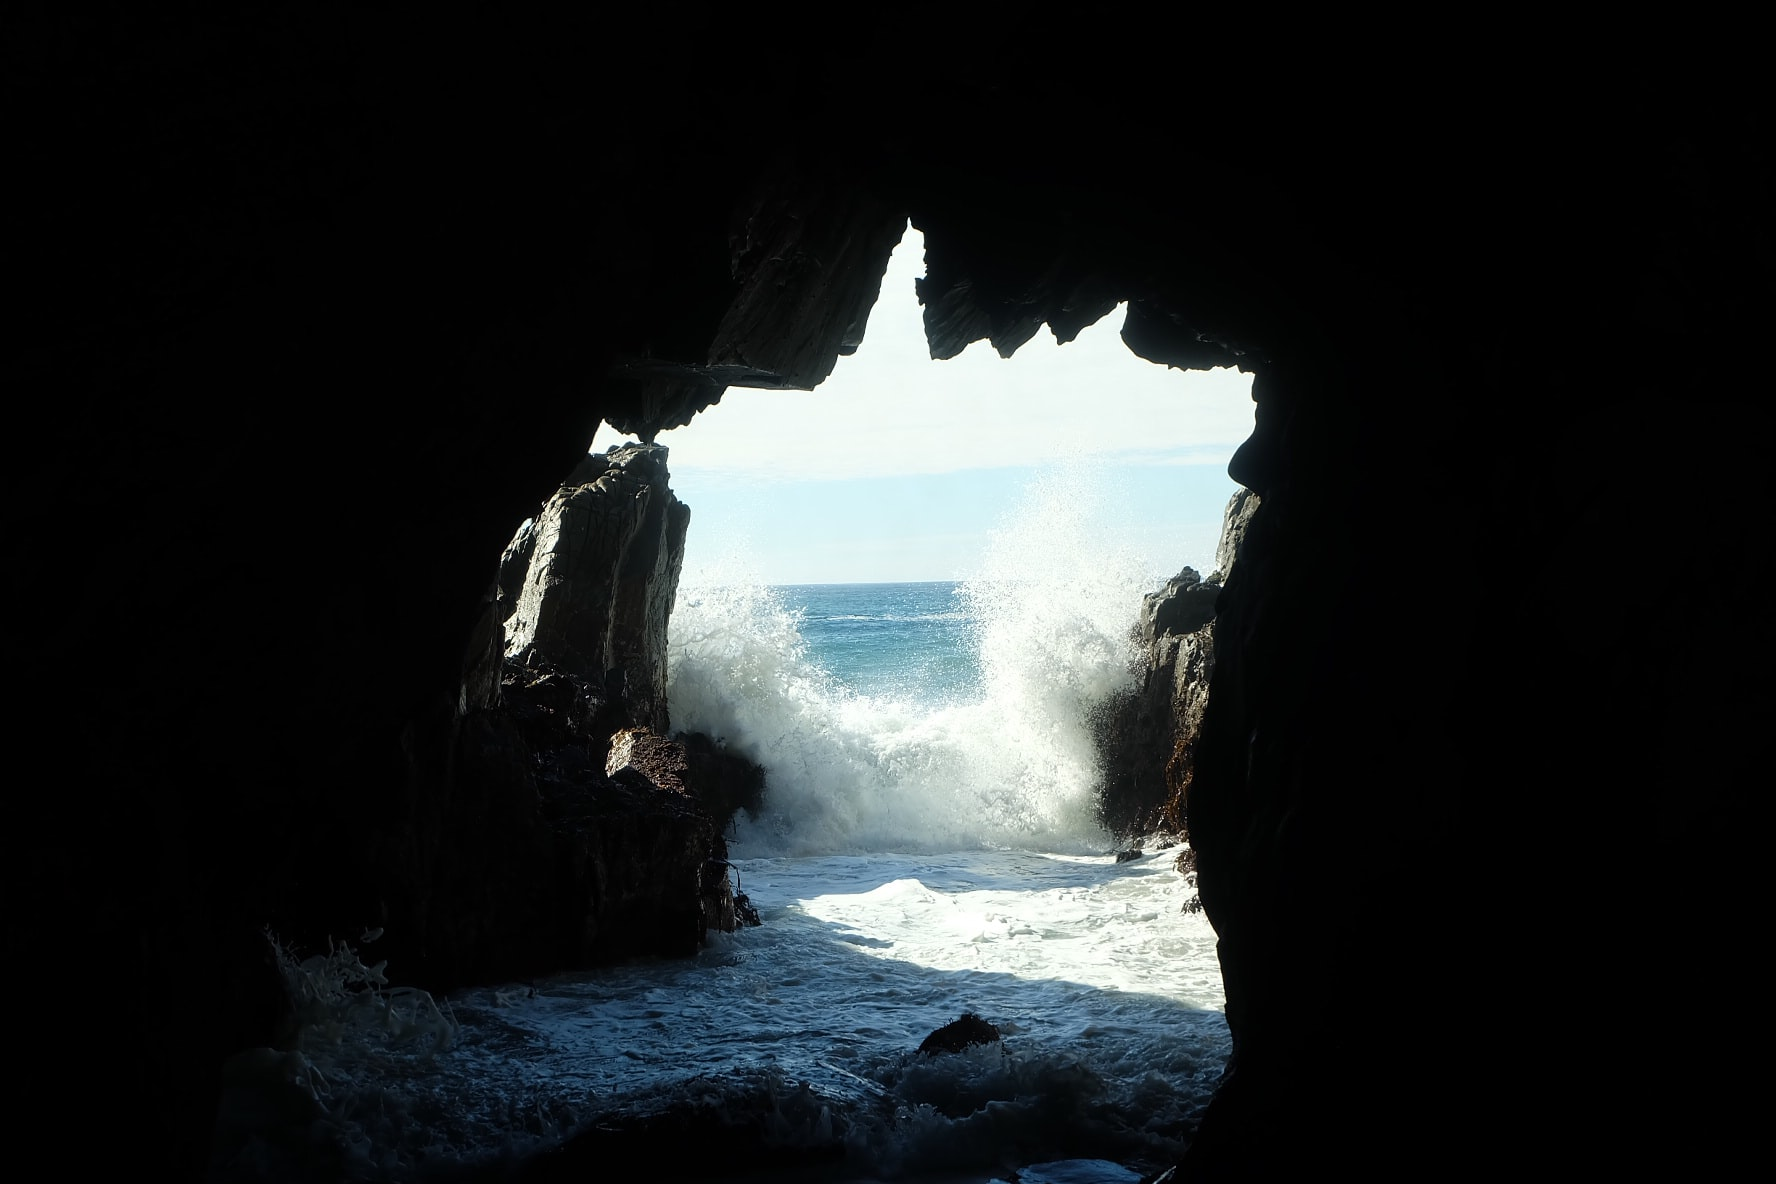 Sea waves splashing at the entrance to a dark sea cave